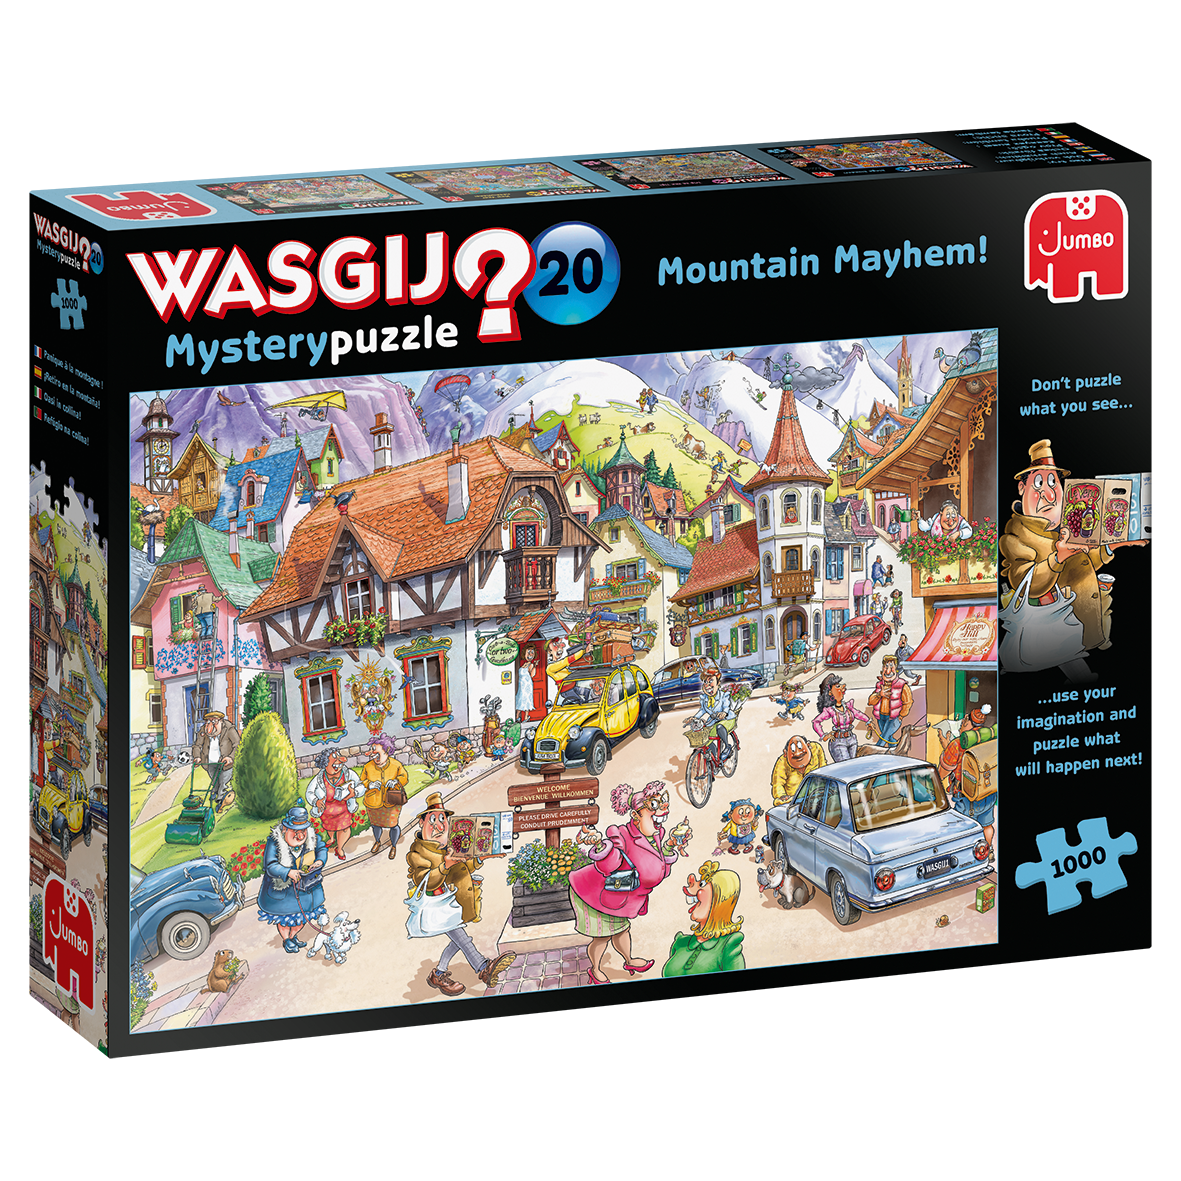 PUZZLE 1000 pcs - Wasgij Mystery puzzle 20 - JUMBO